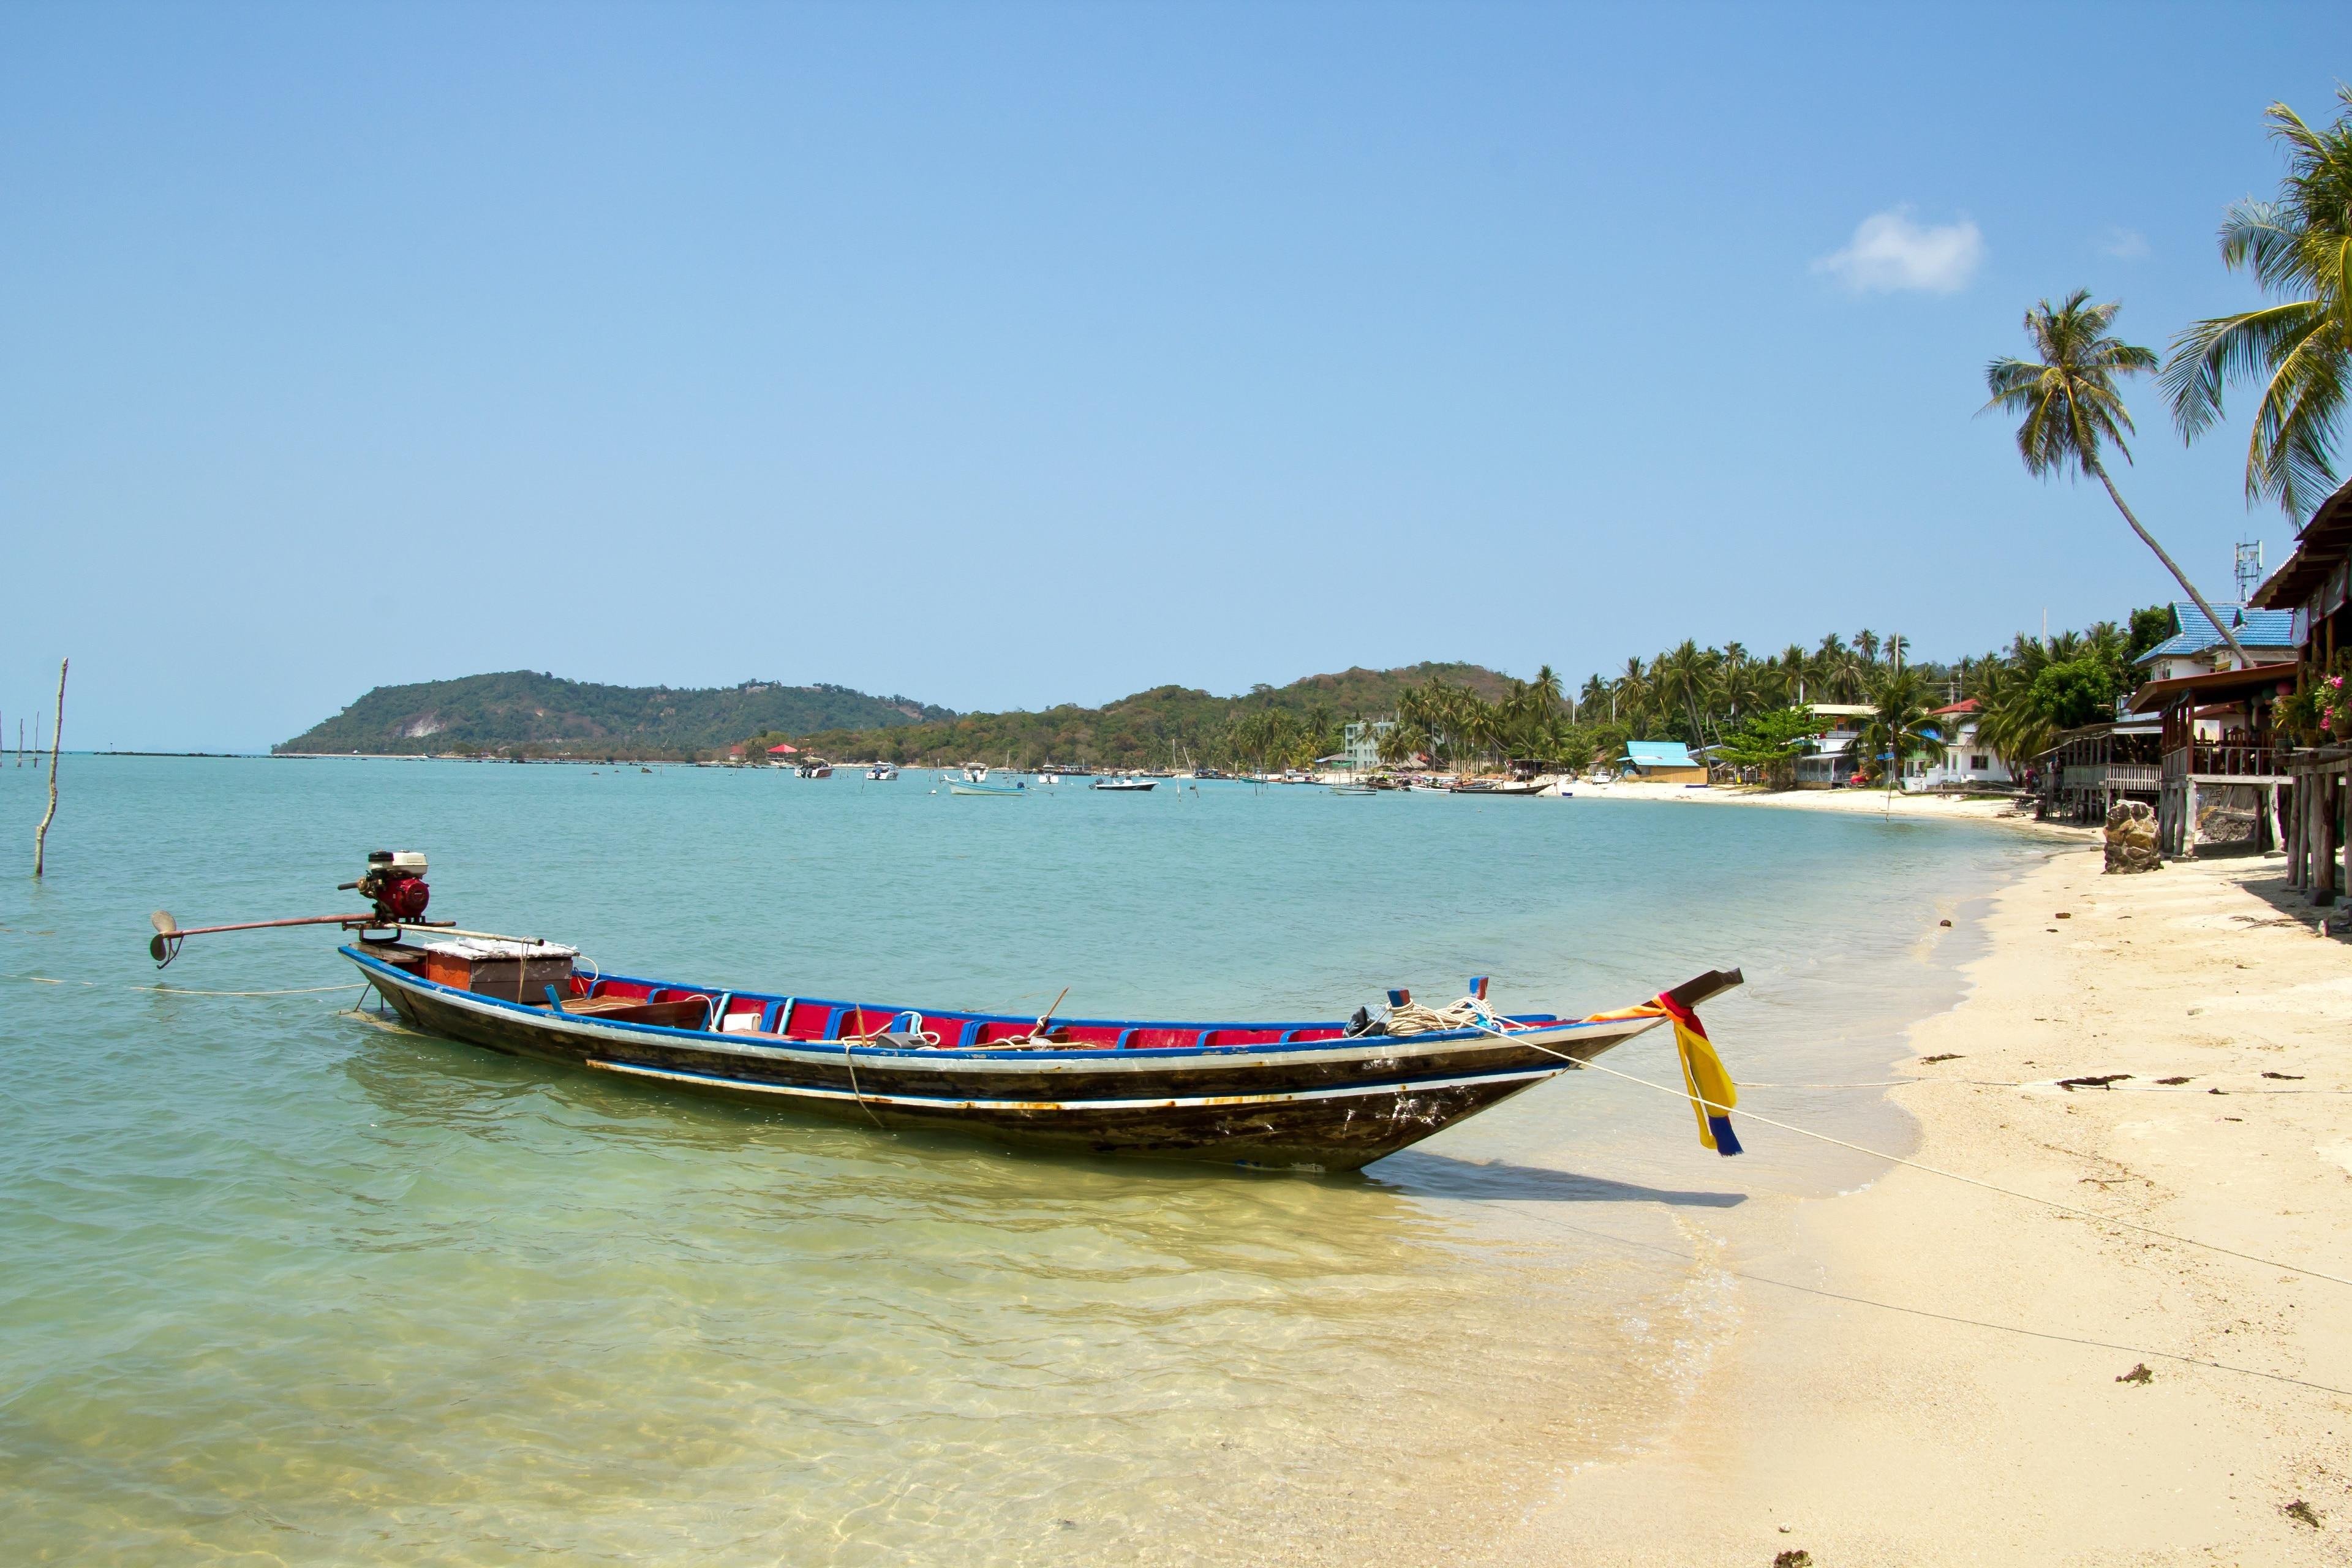 Laem Set, Koh Samui, Surat Thani Province, Thailand